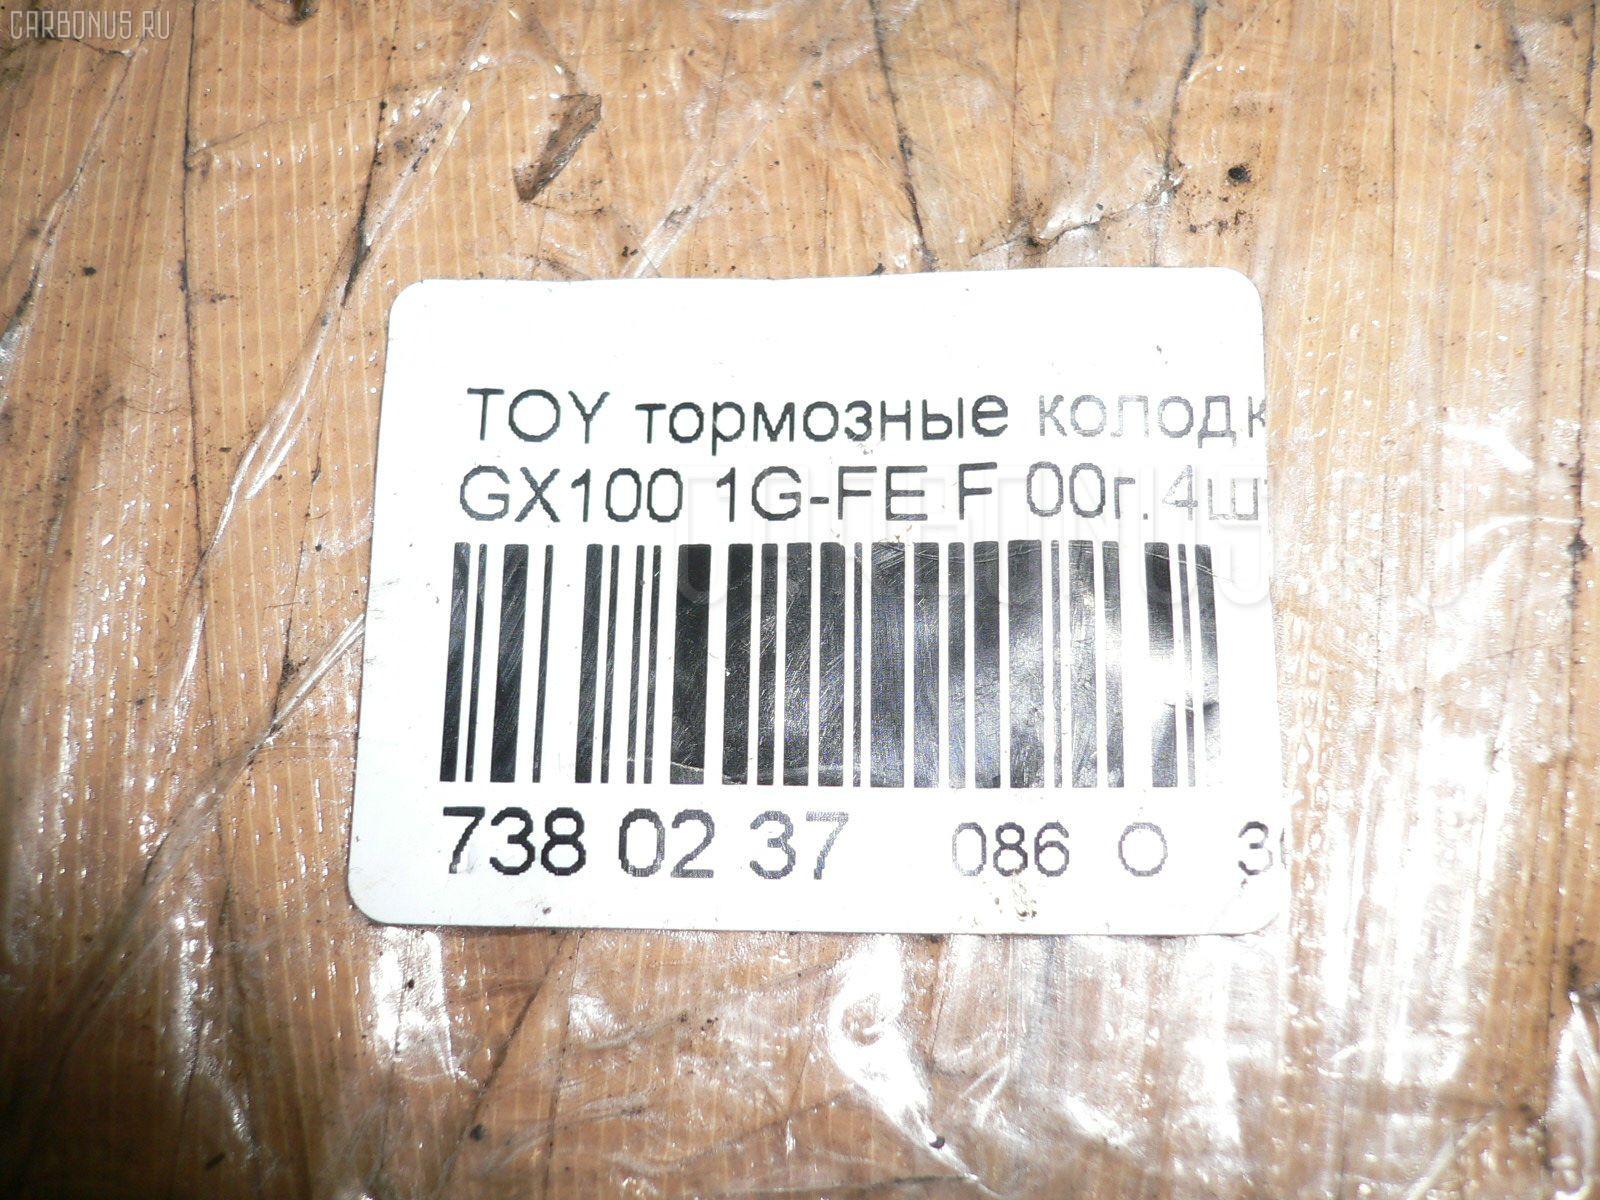 Тормозные колодки TOYOTA GX100 1G-FE Фото 4